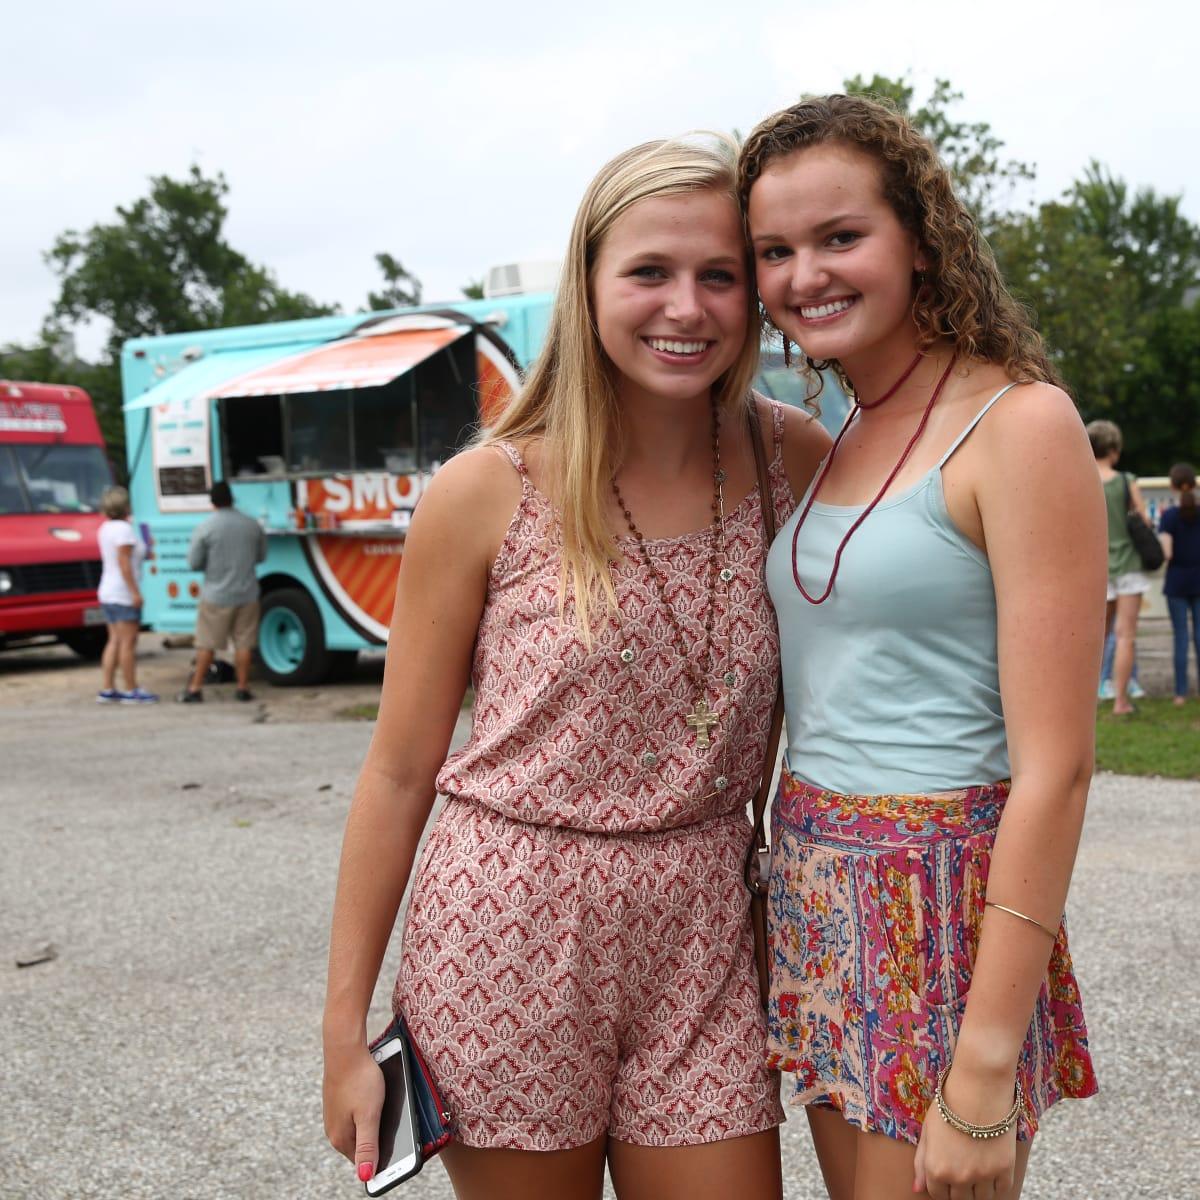 News, Shelby, Evelyn's Park groundbreaking, June 2015, Lilli Storemski, Olivia Mcguire